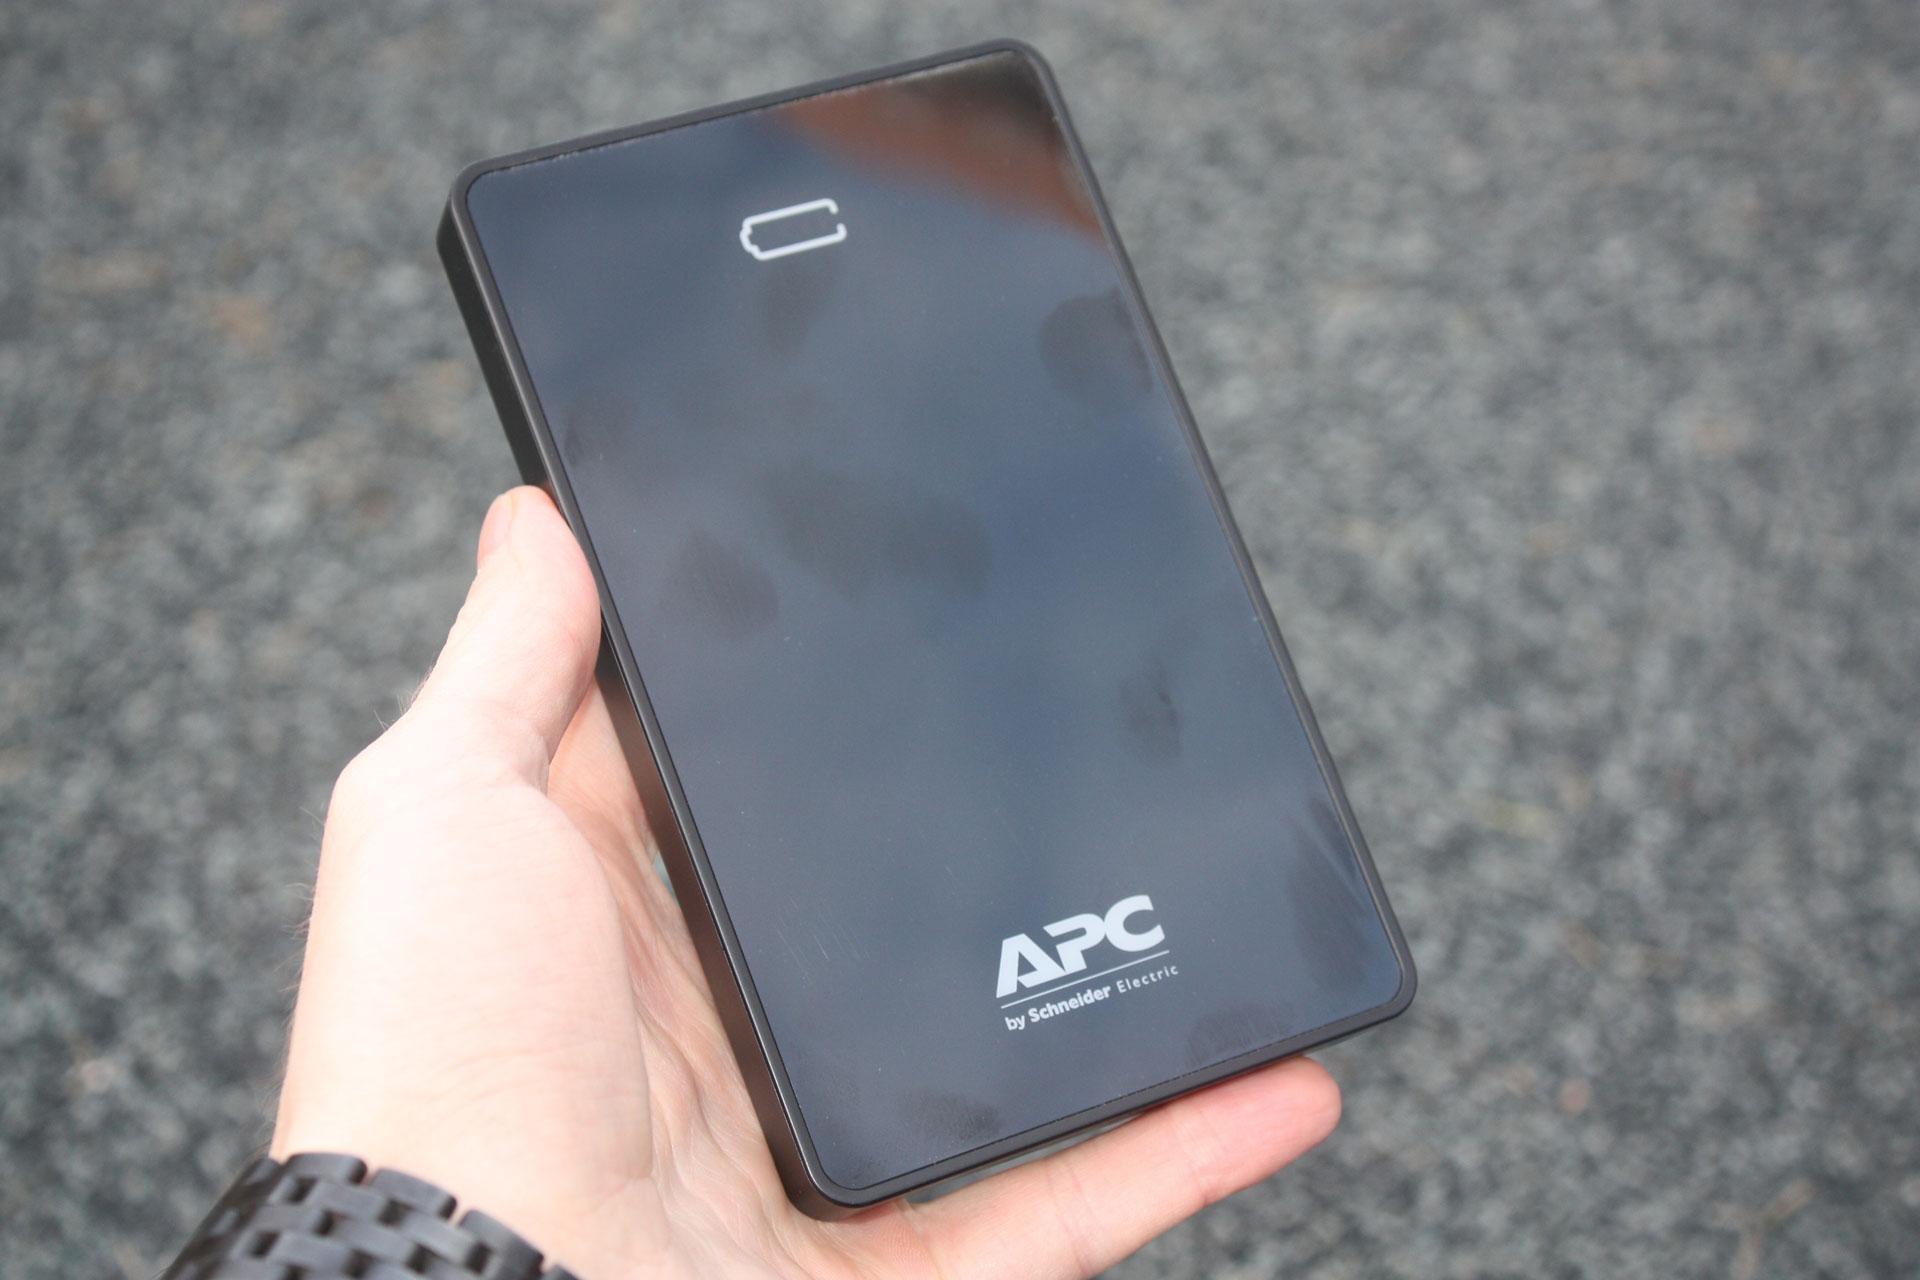 Обзор внешнего аккумулятора APC Mobile Power Pack M10 (M10BK/WH-EC)